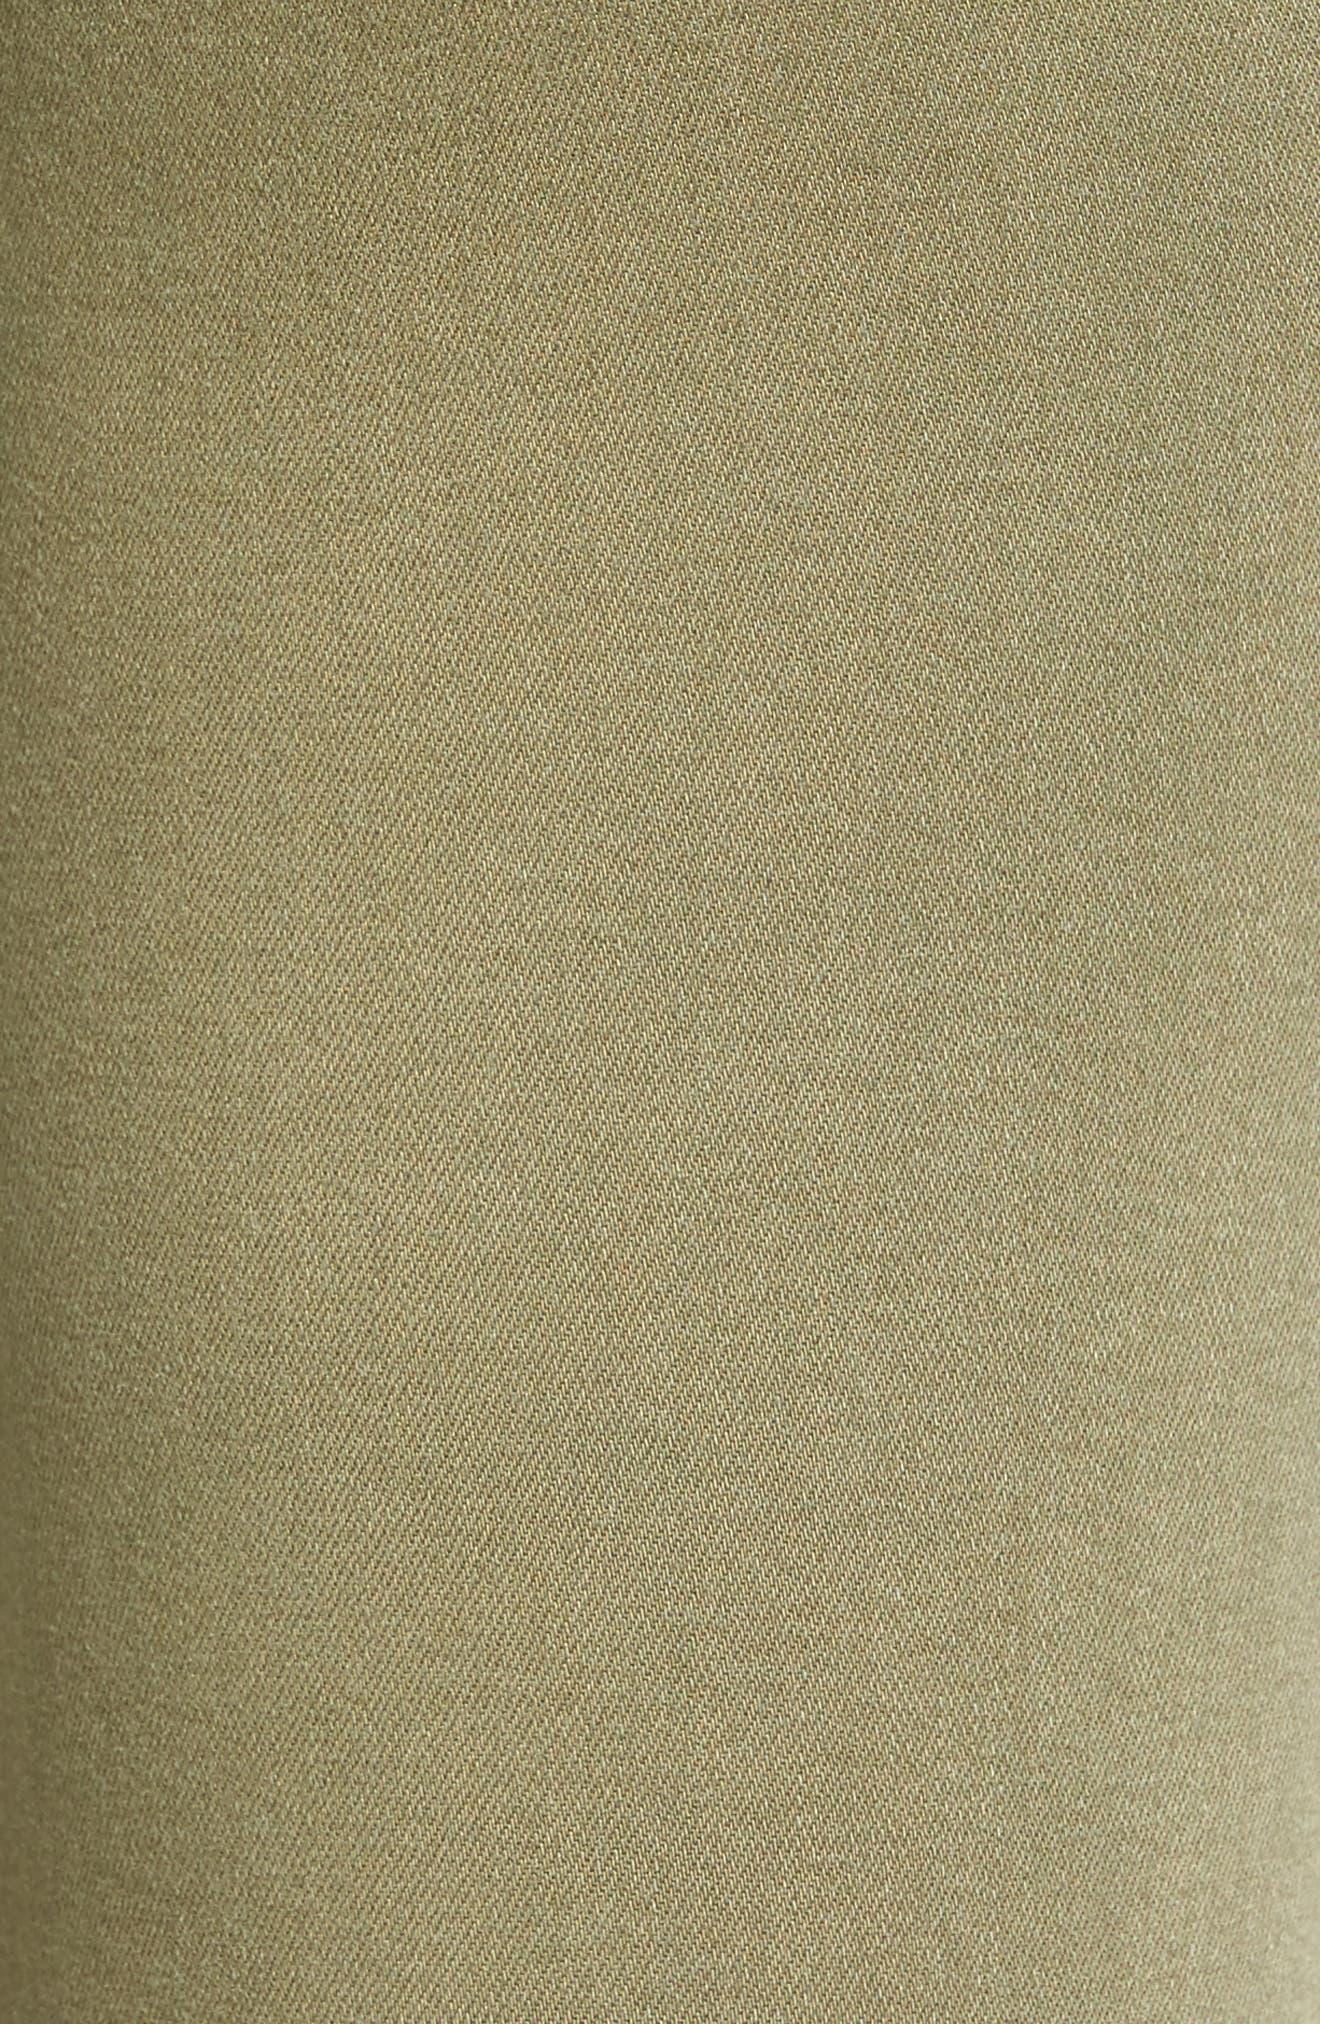 Transcend - Verdugo Ankle Skinny Jeans,                             Alternate thumbnail 4, color,                             300